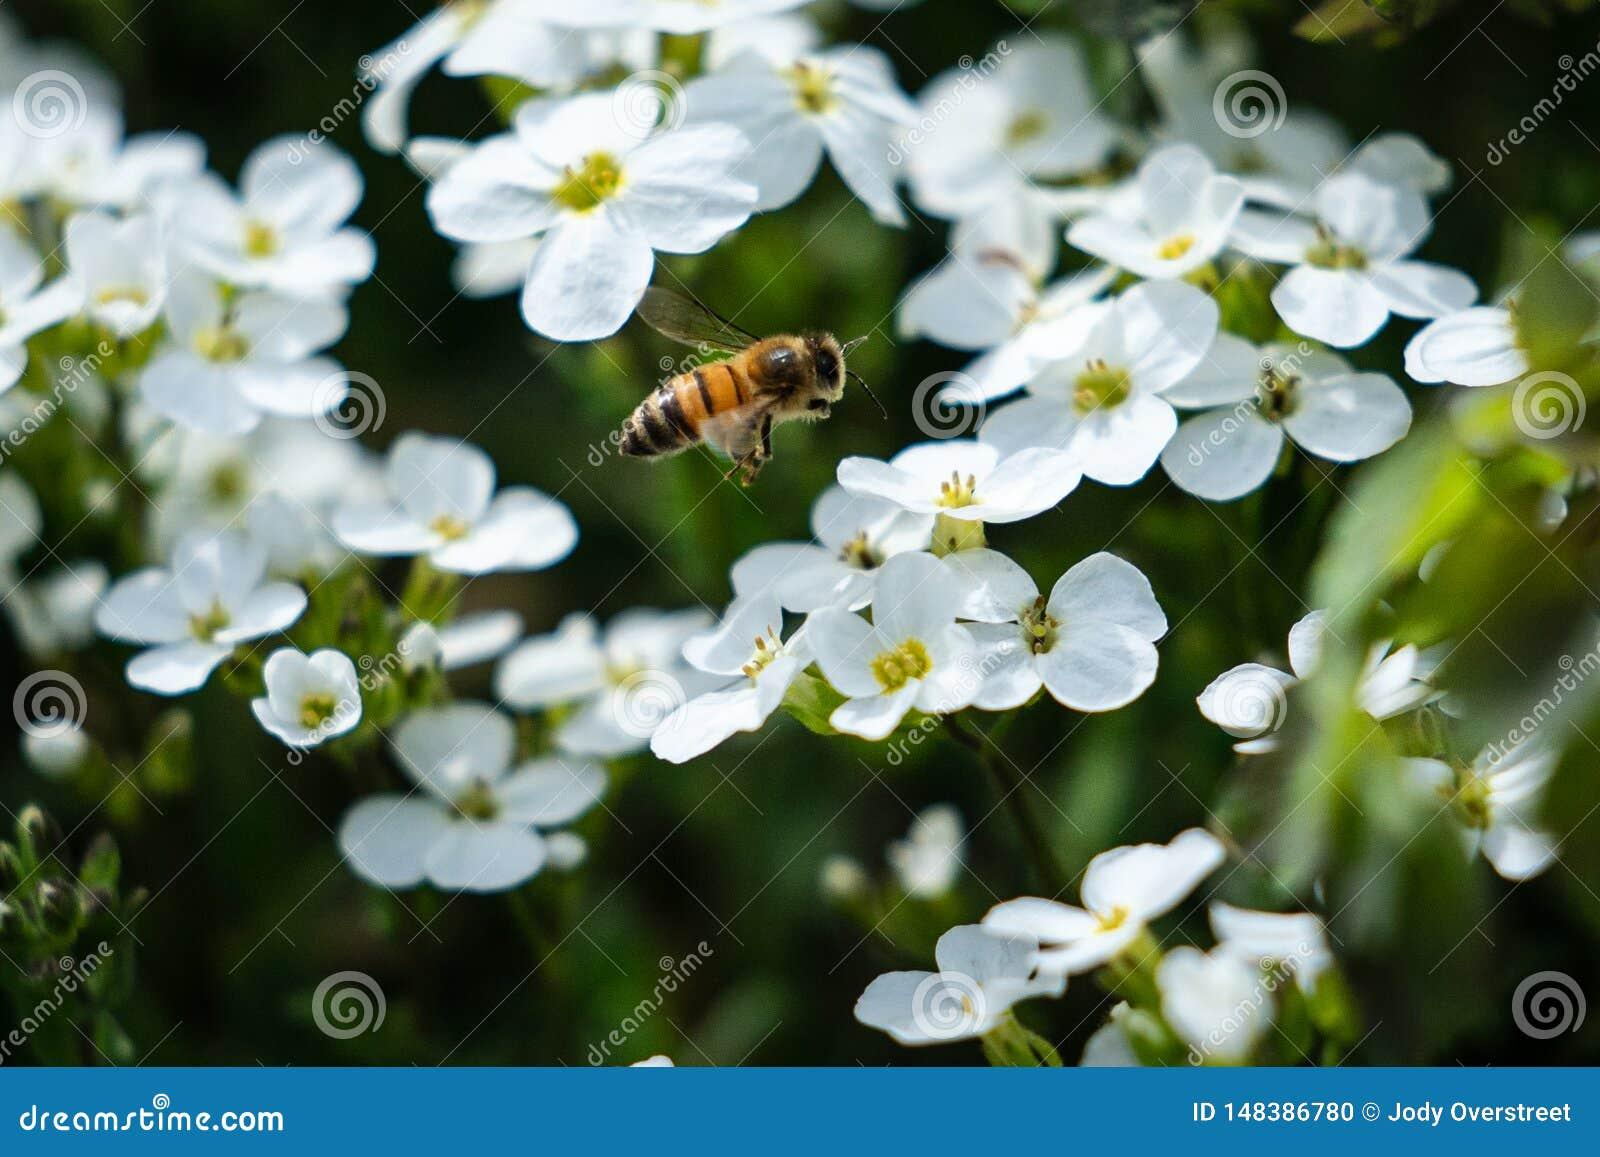 Working Bee at Alaska Botanical Garden